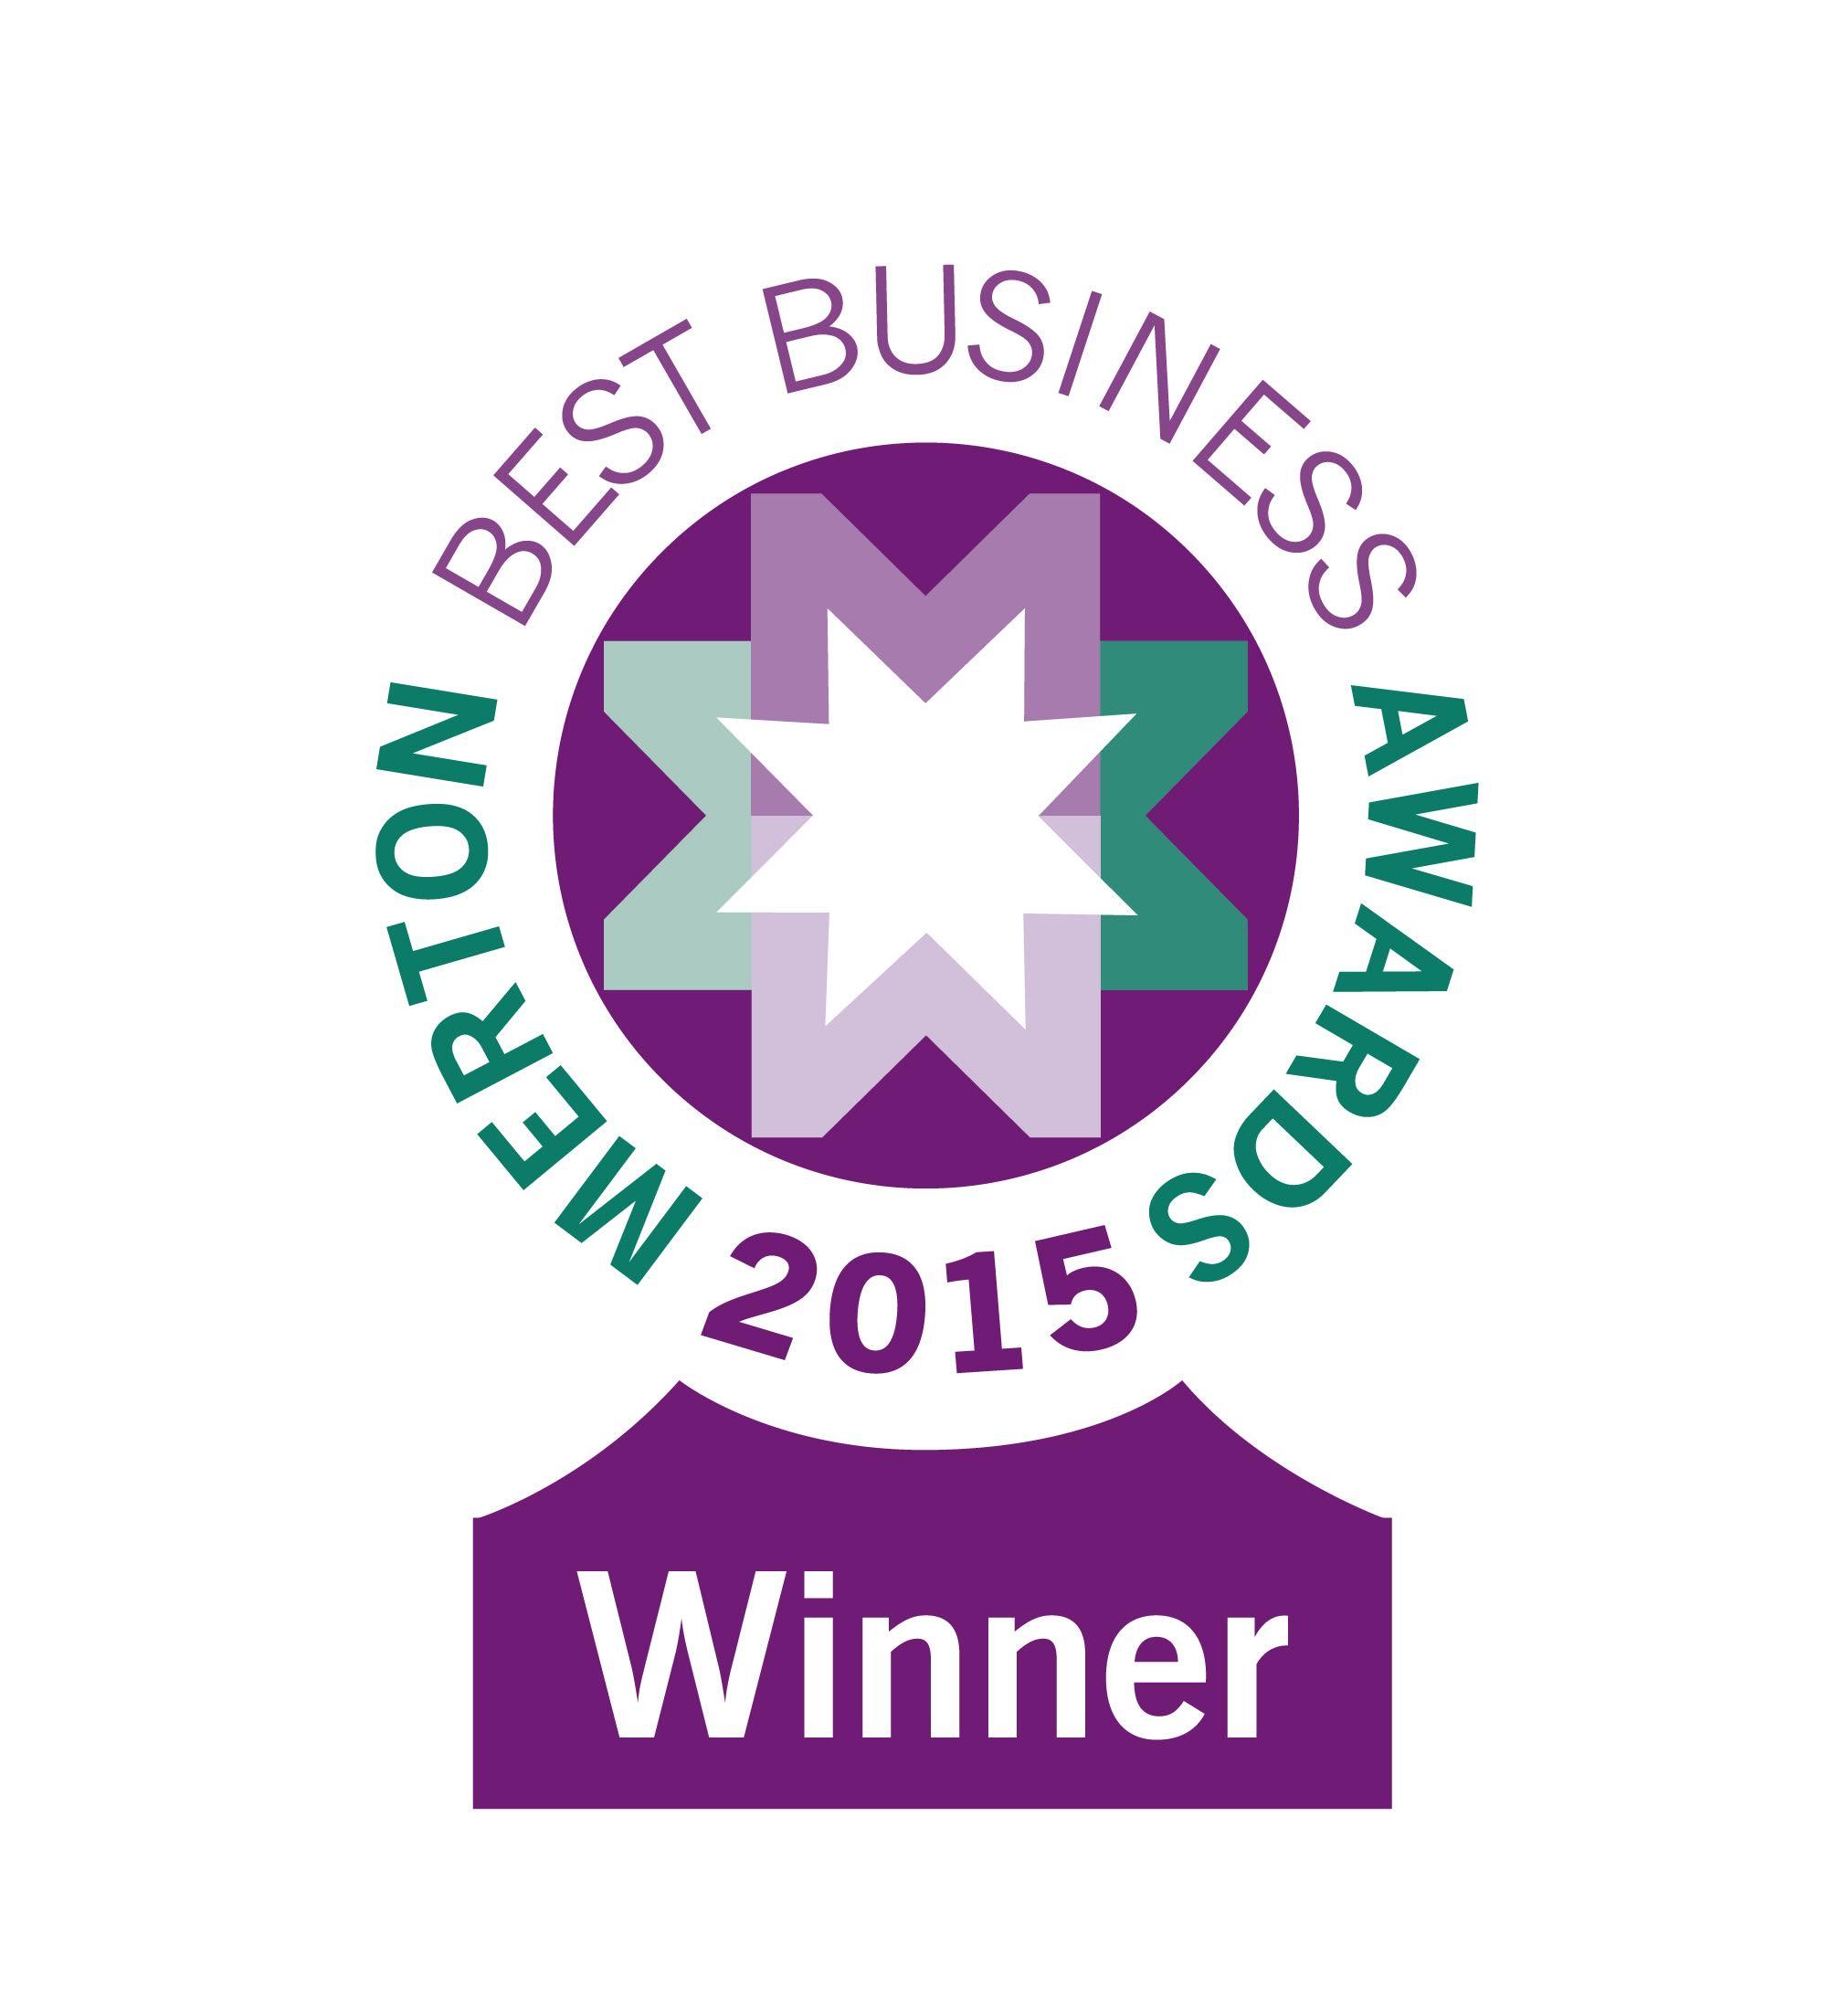 Merton Best New Business 2015